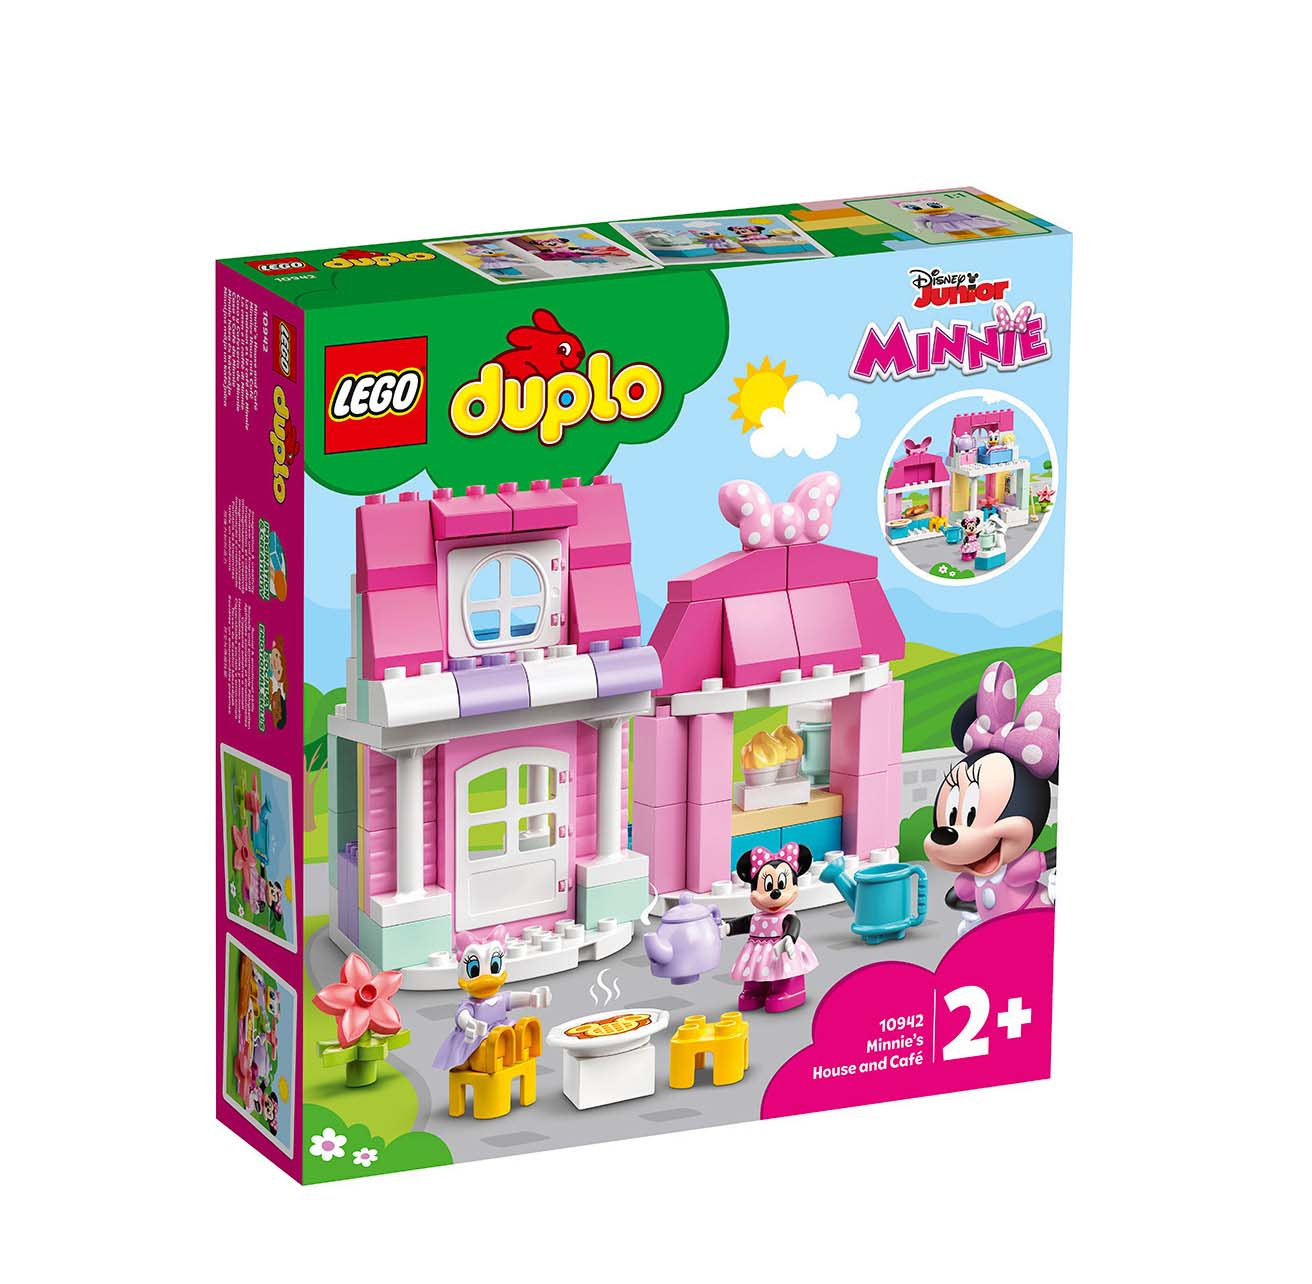 Lego Duplo: Minnie's House and Café 10942